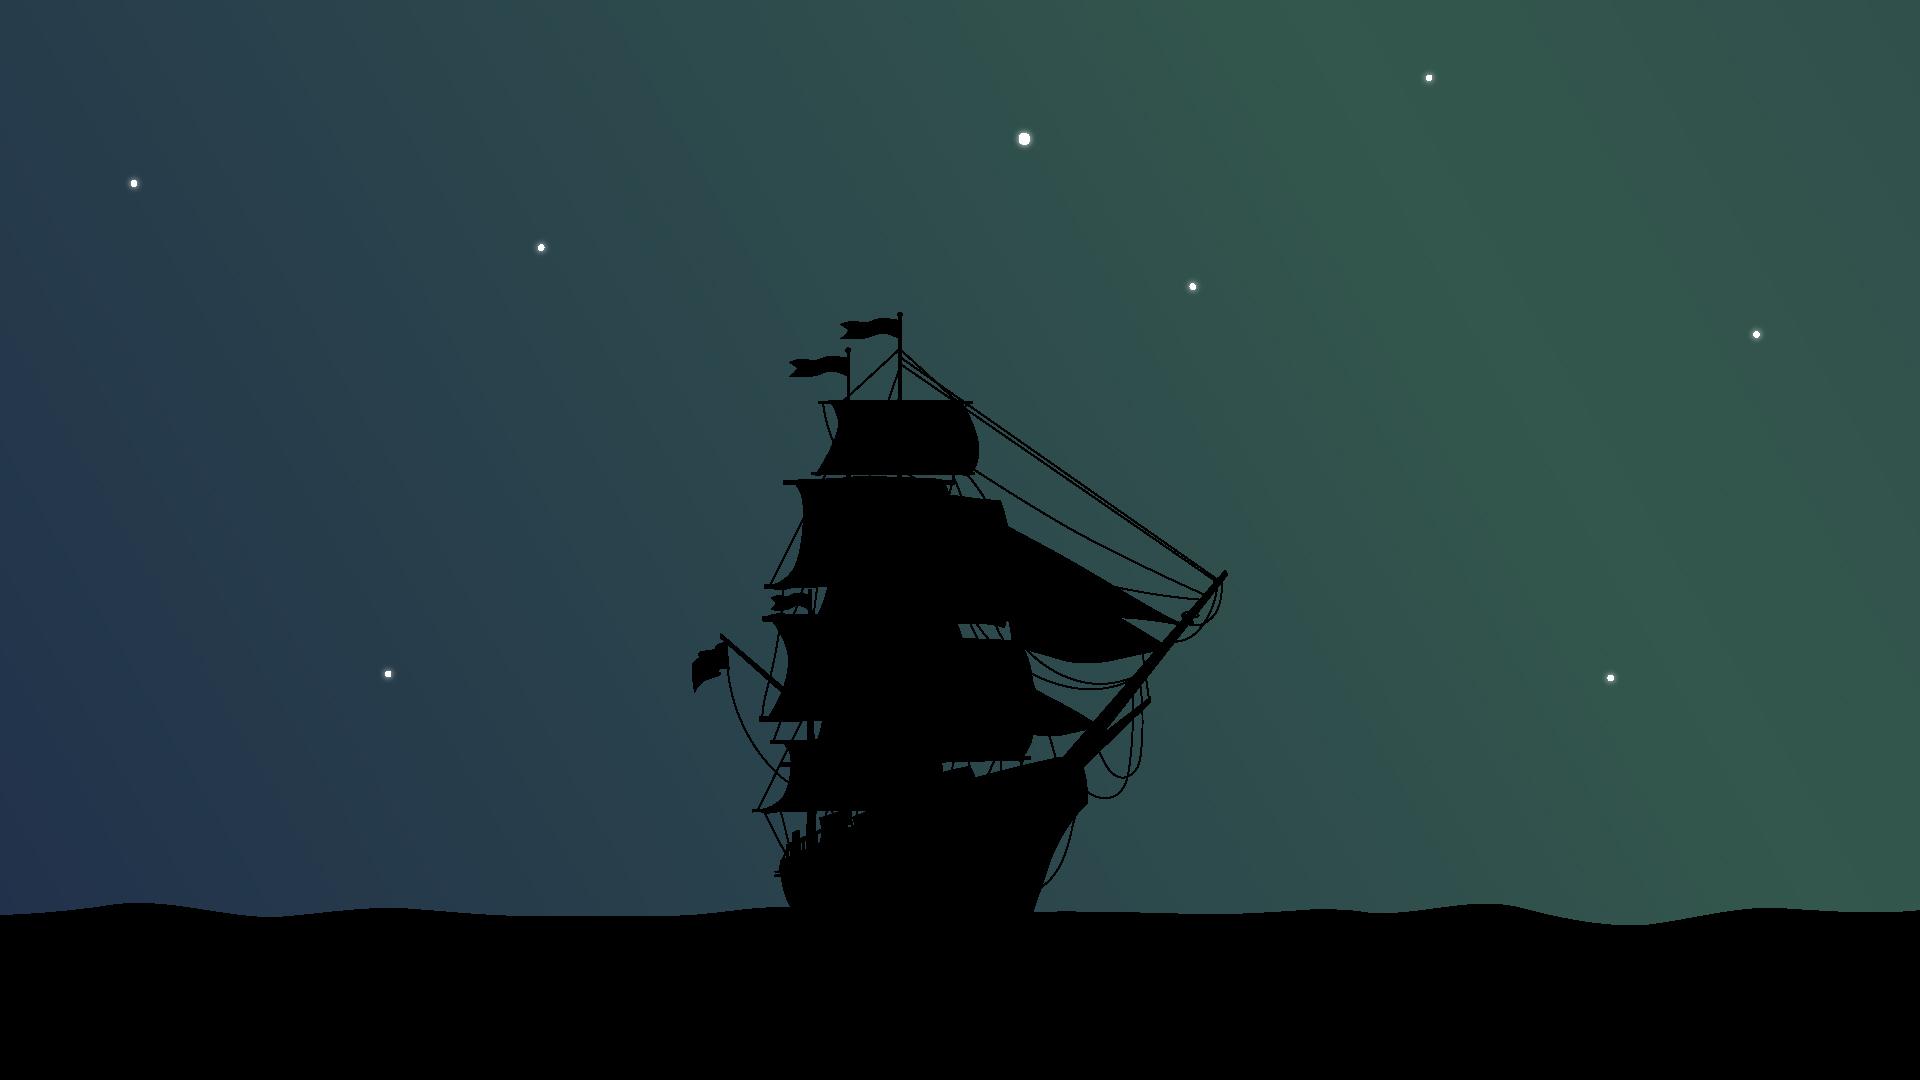 Minimalist Desktop Wallpaper Pirate Ship